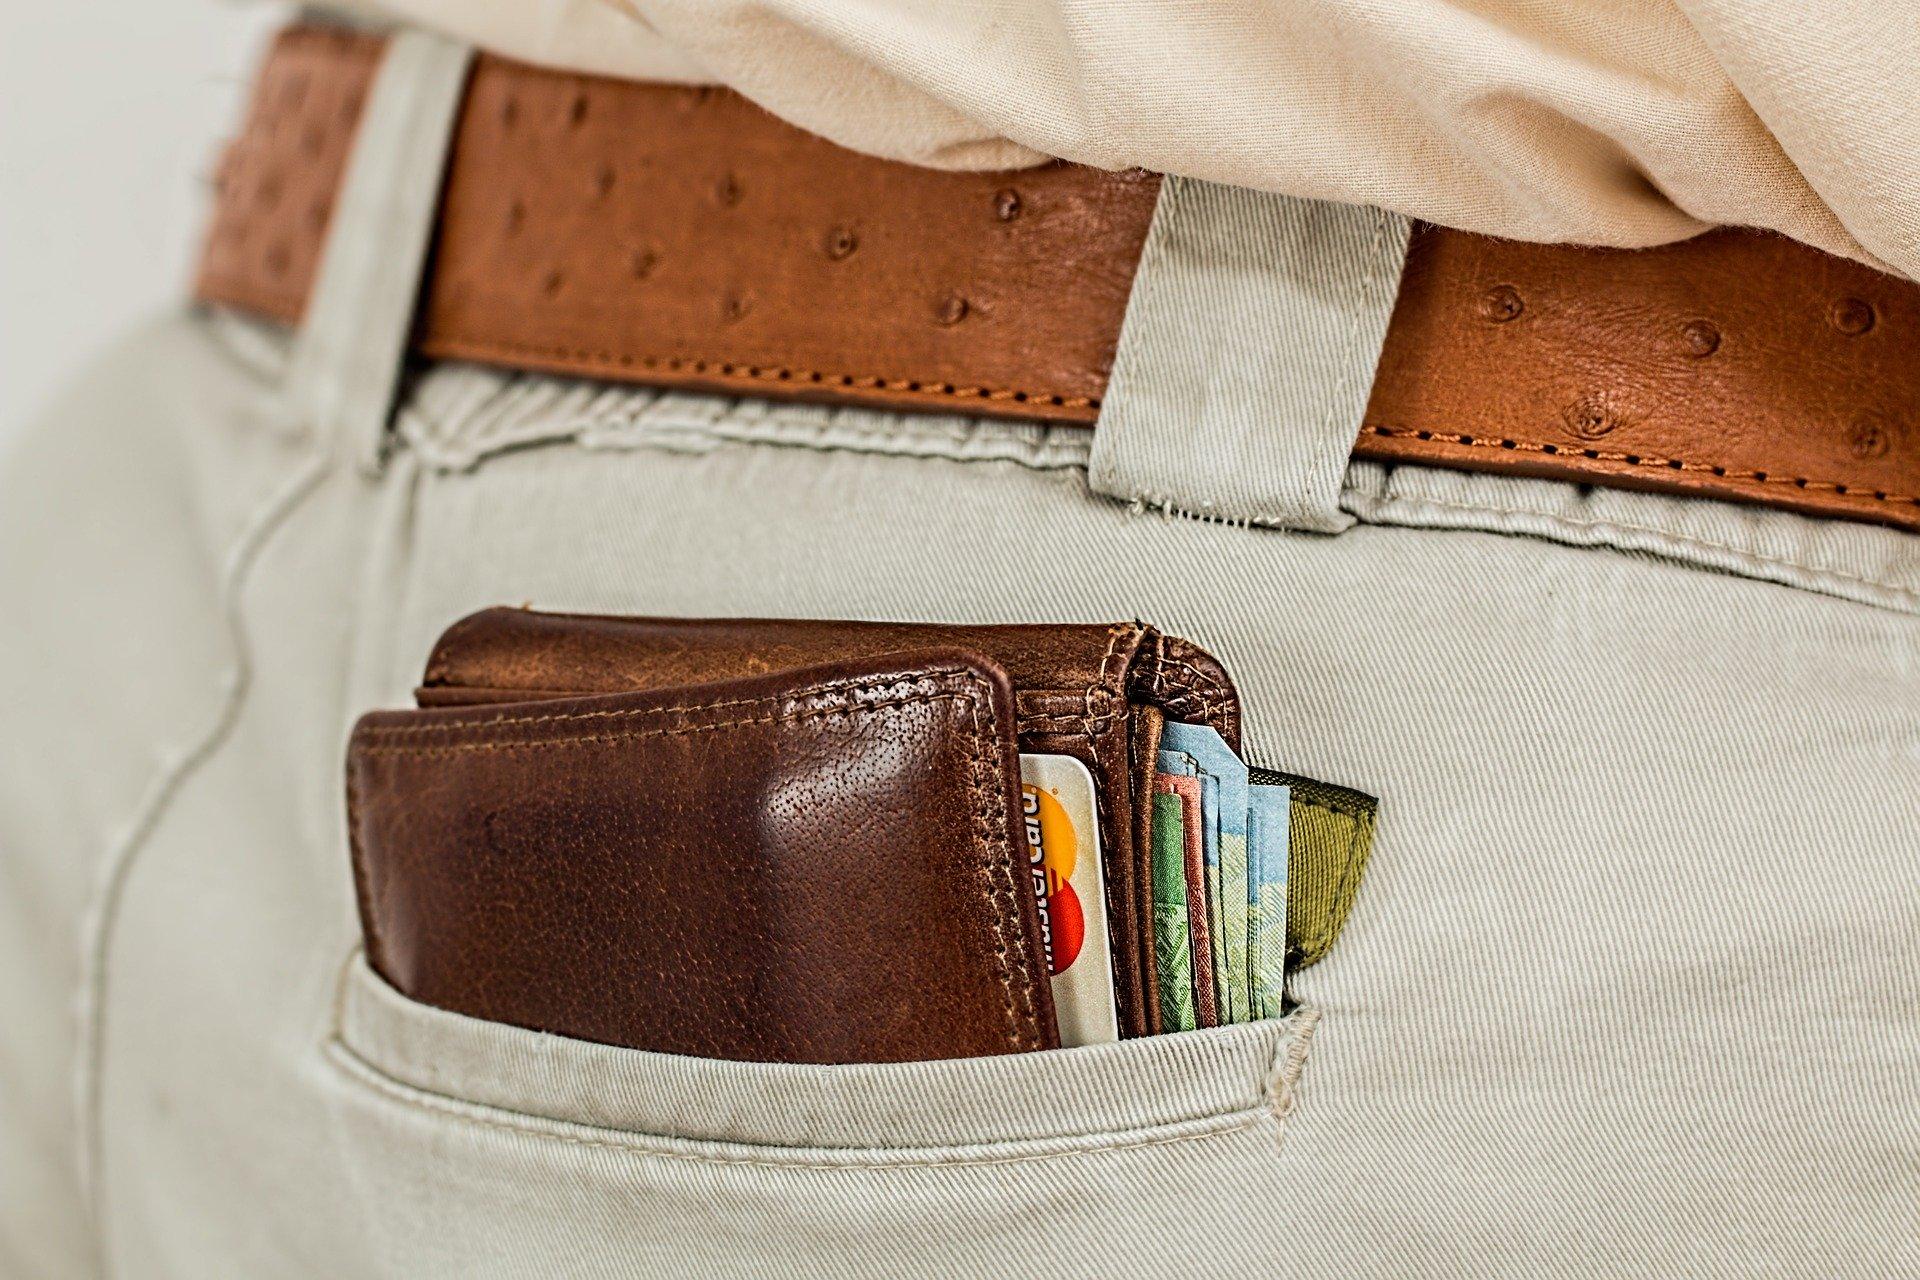 wallet-1013789_1920-4